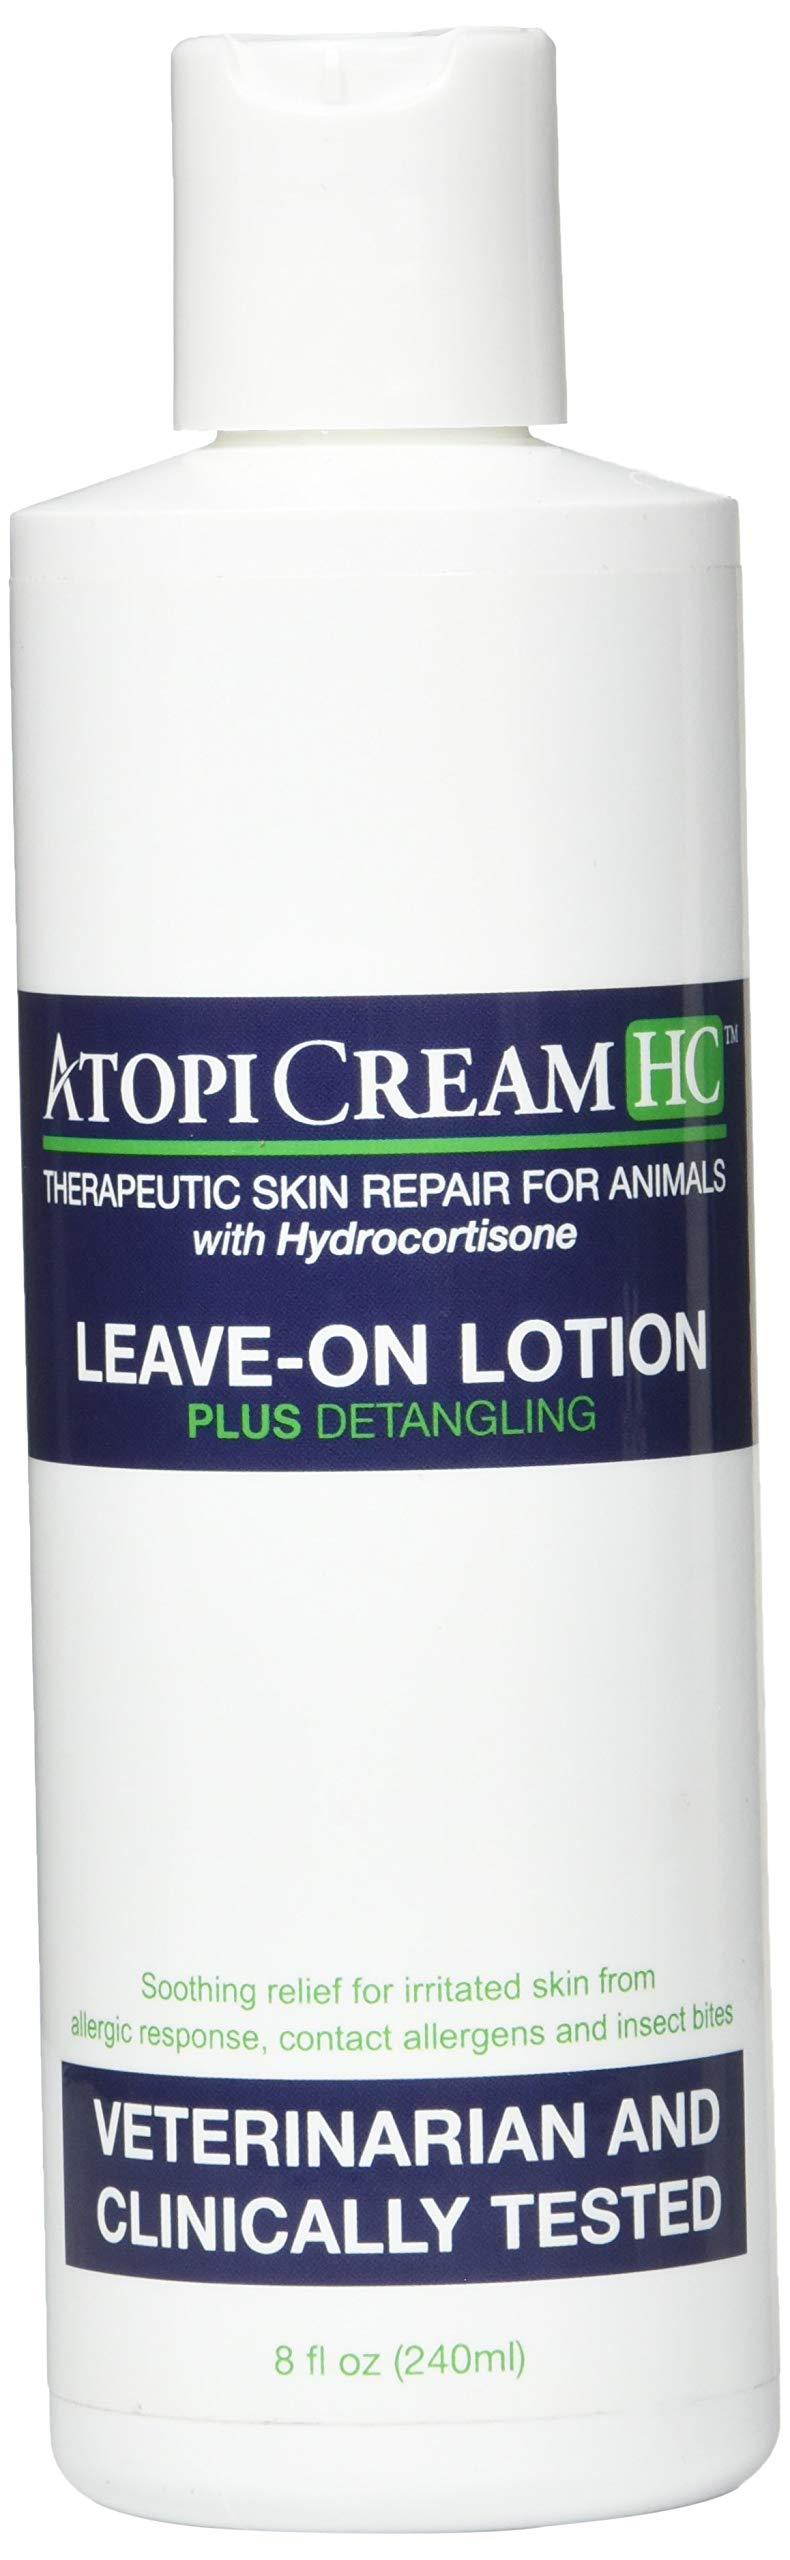 VetriMAX AtopiCream HC 1% Hydrocortisone Leave-on Lotion for Animals